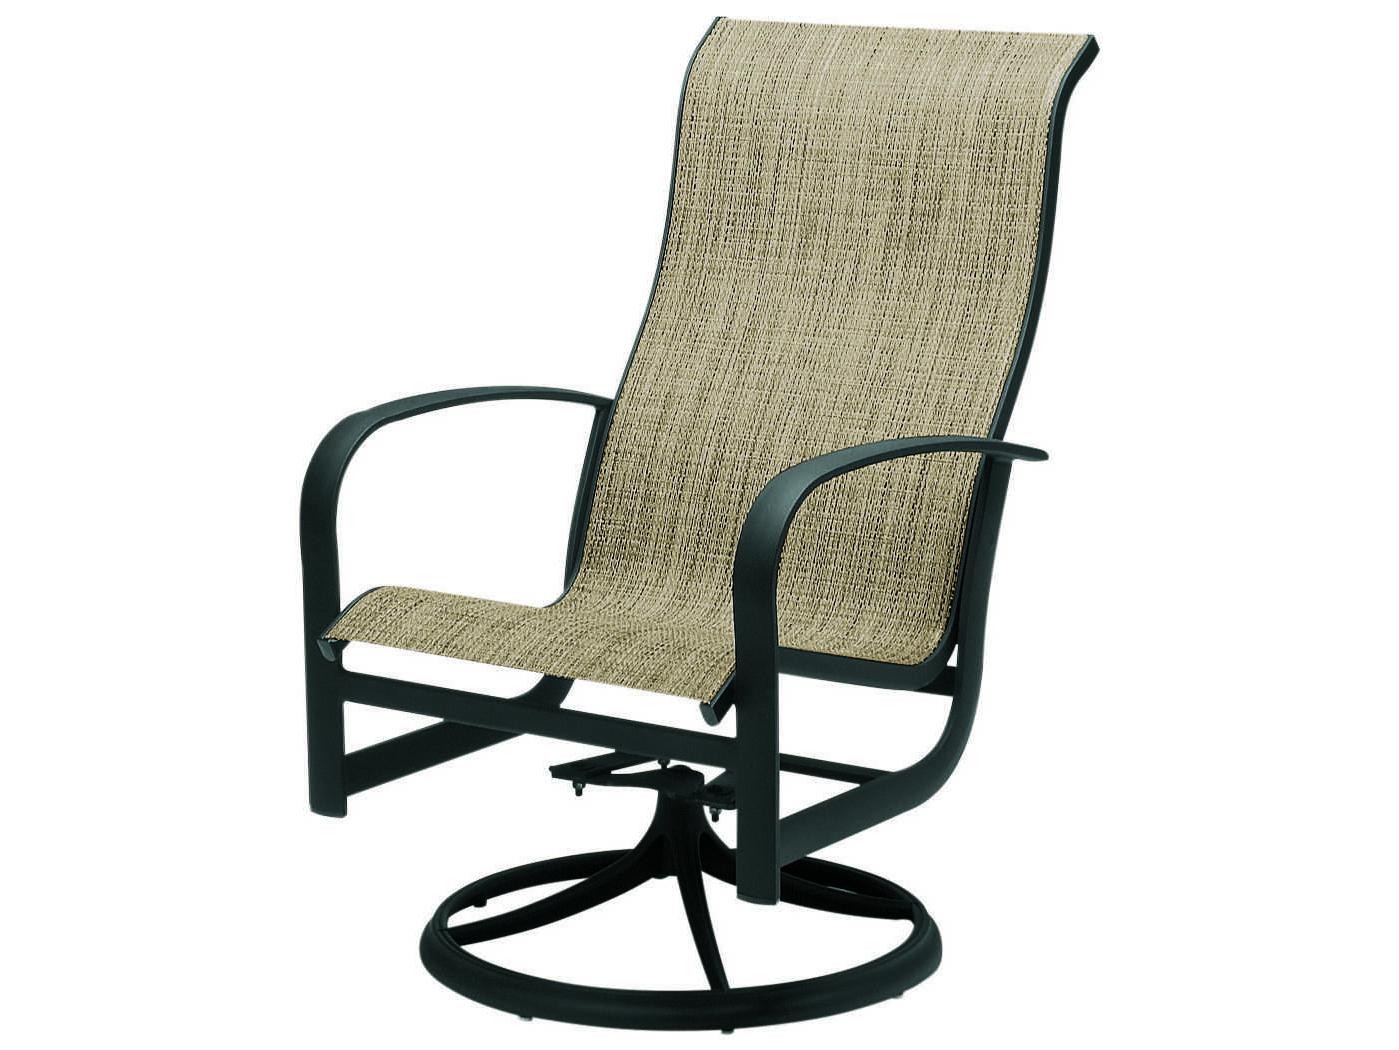 Most Current Padded Sling High Back Swivel Chairs Regarding Woodard Fremont Sling Aluminum High Back Swivel Rocker (View 14 of 30)